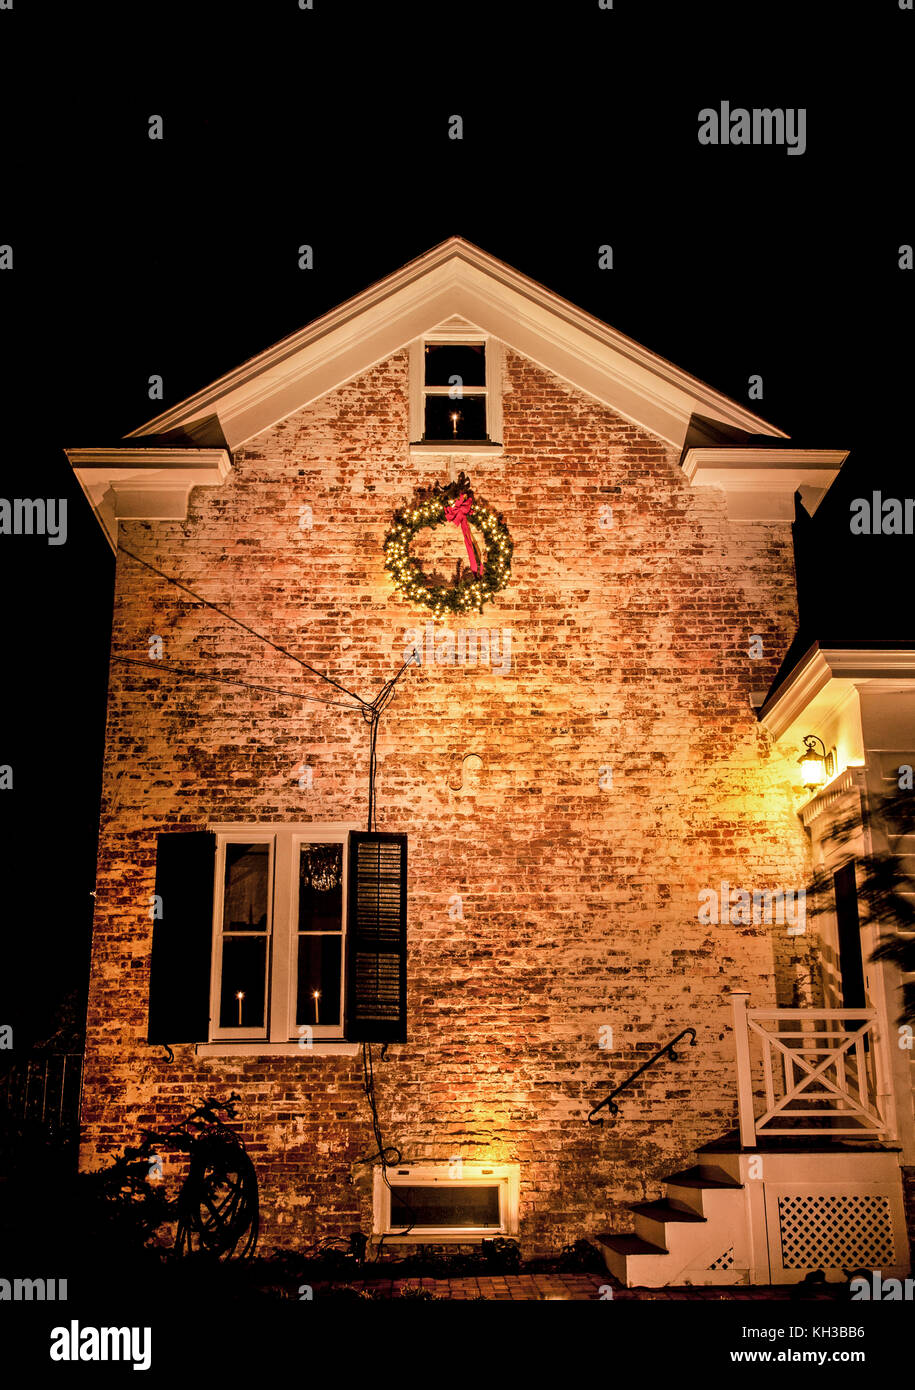 Christmas lights house exterior stock photos christmas lights house exterior stock images alamy for Christmas lights for house exterior